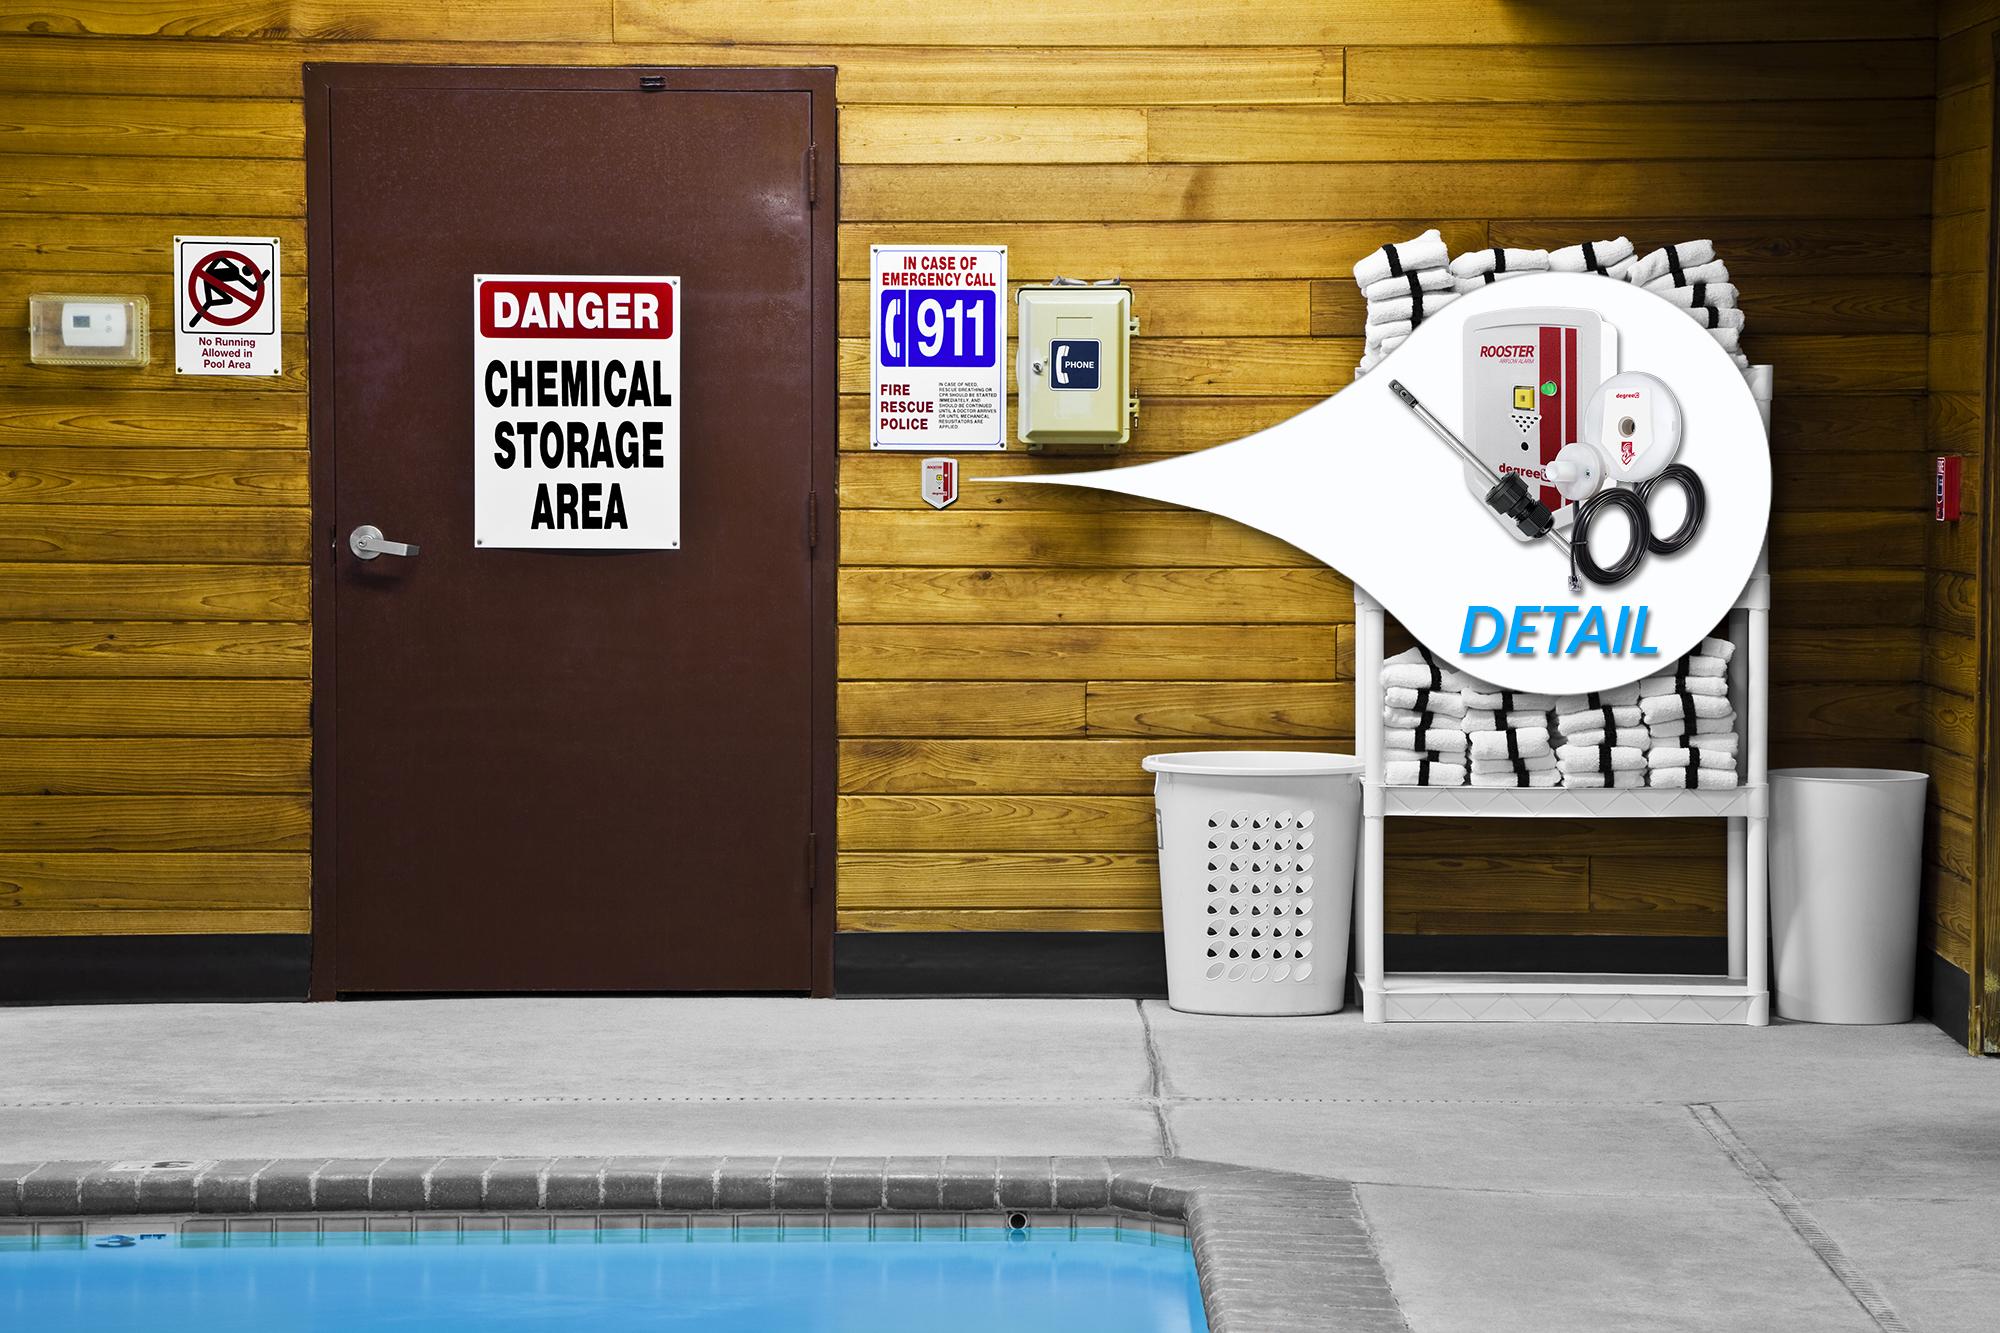 Pool Chemical Storage Alarm